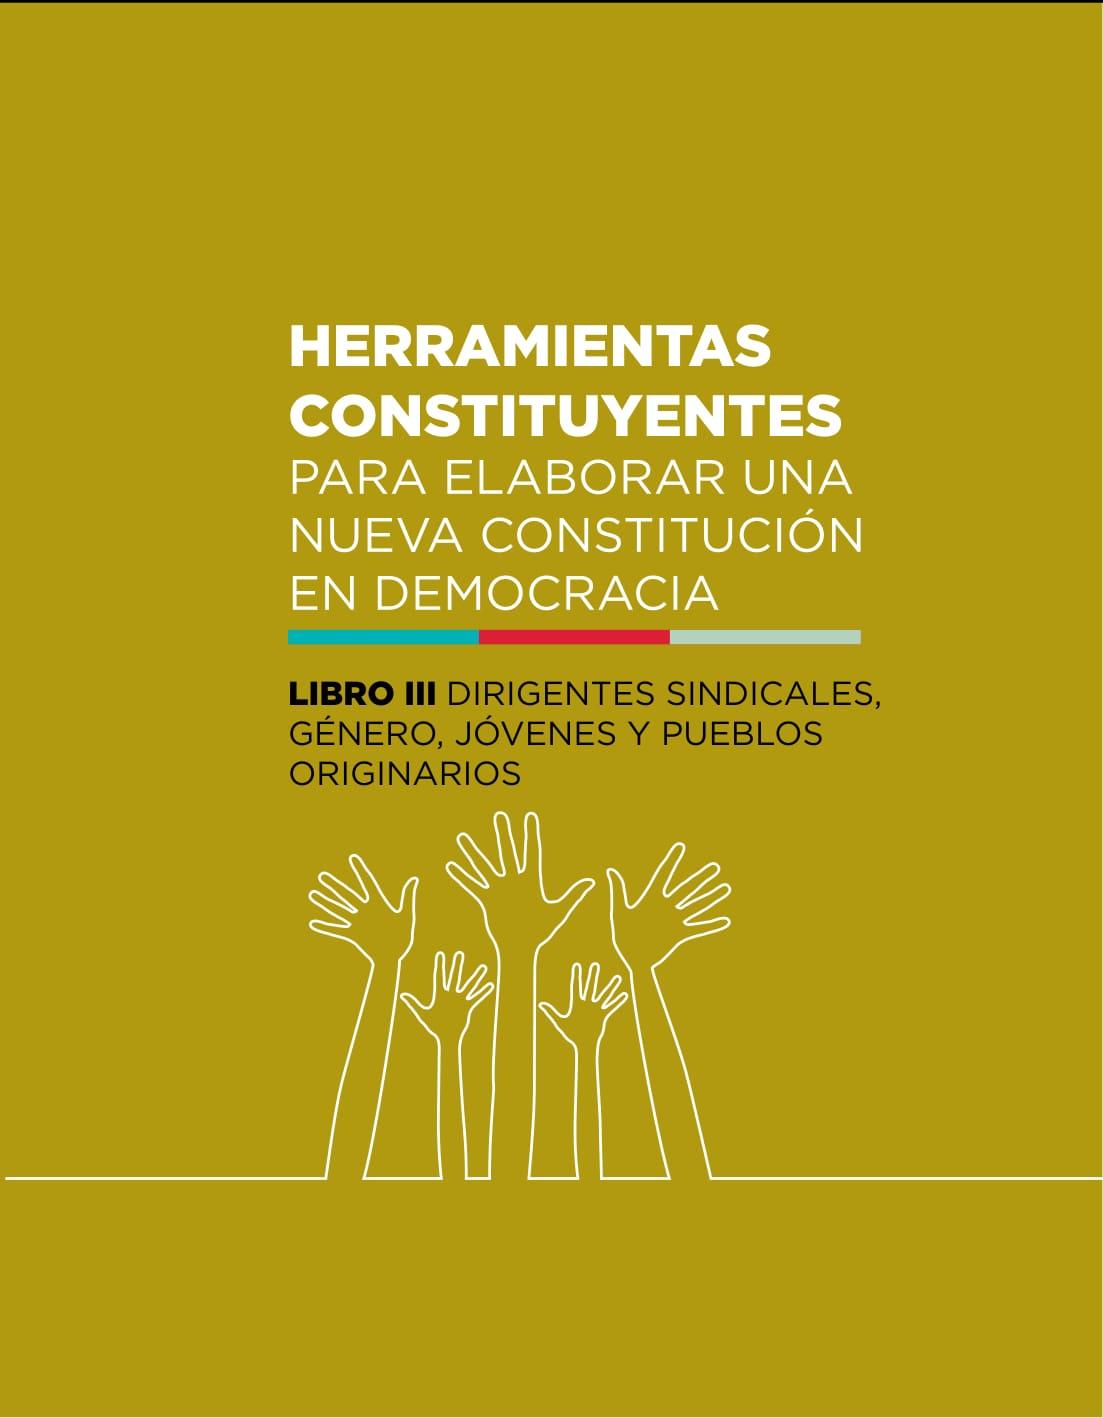 libro-iii-final-01